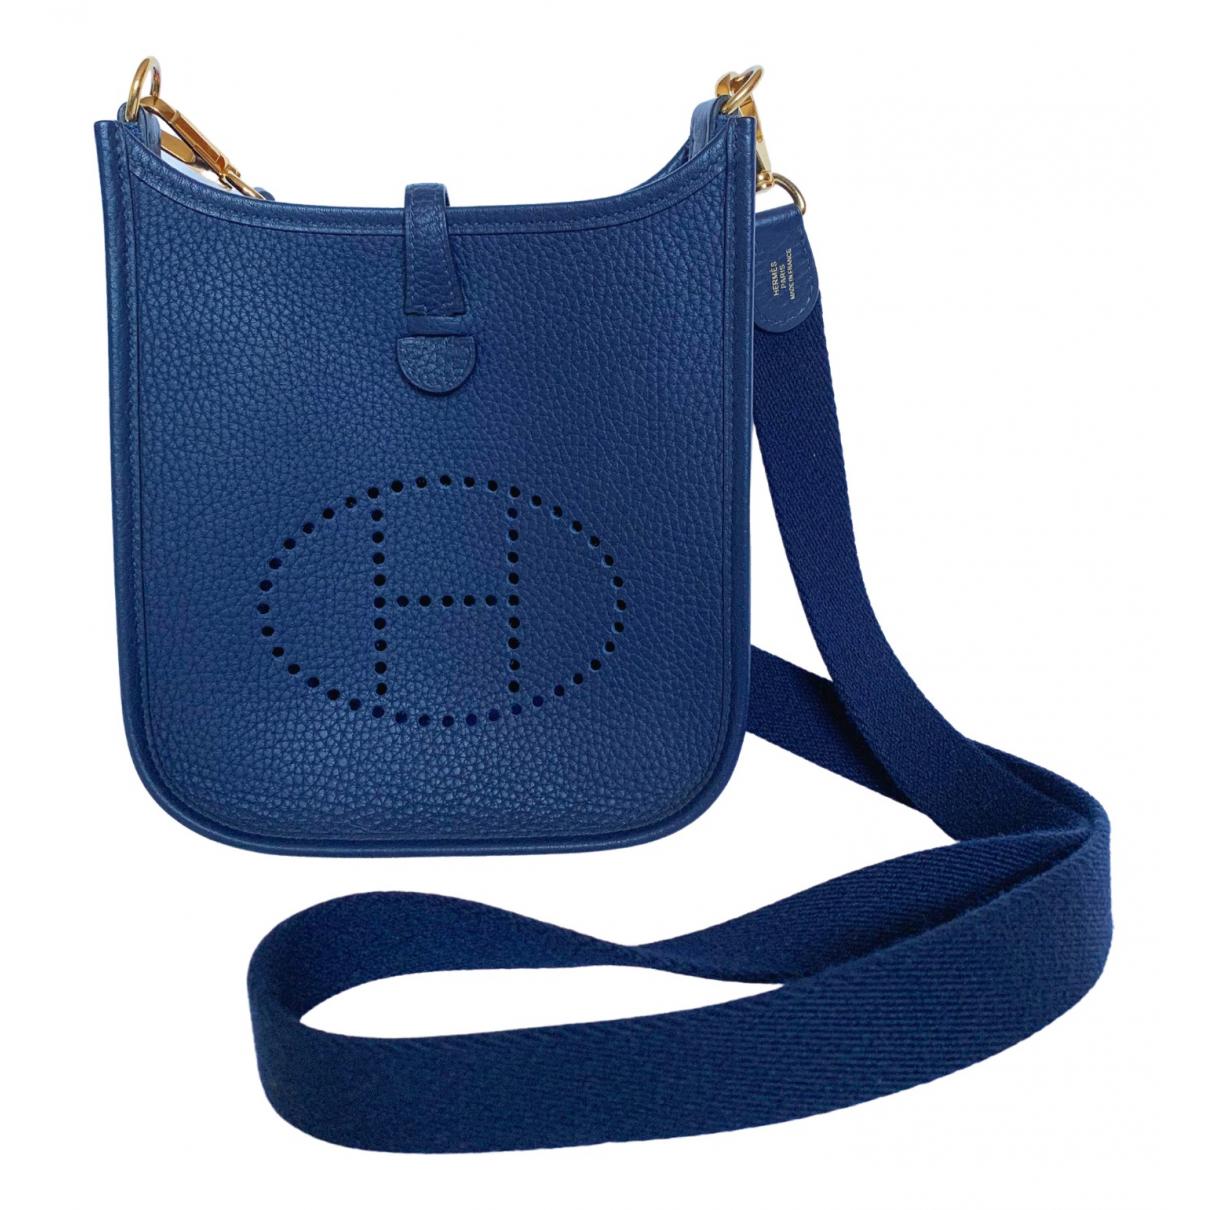 Hermes Evelyne Handtasche in  Marine Leder